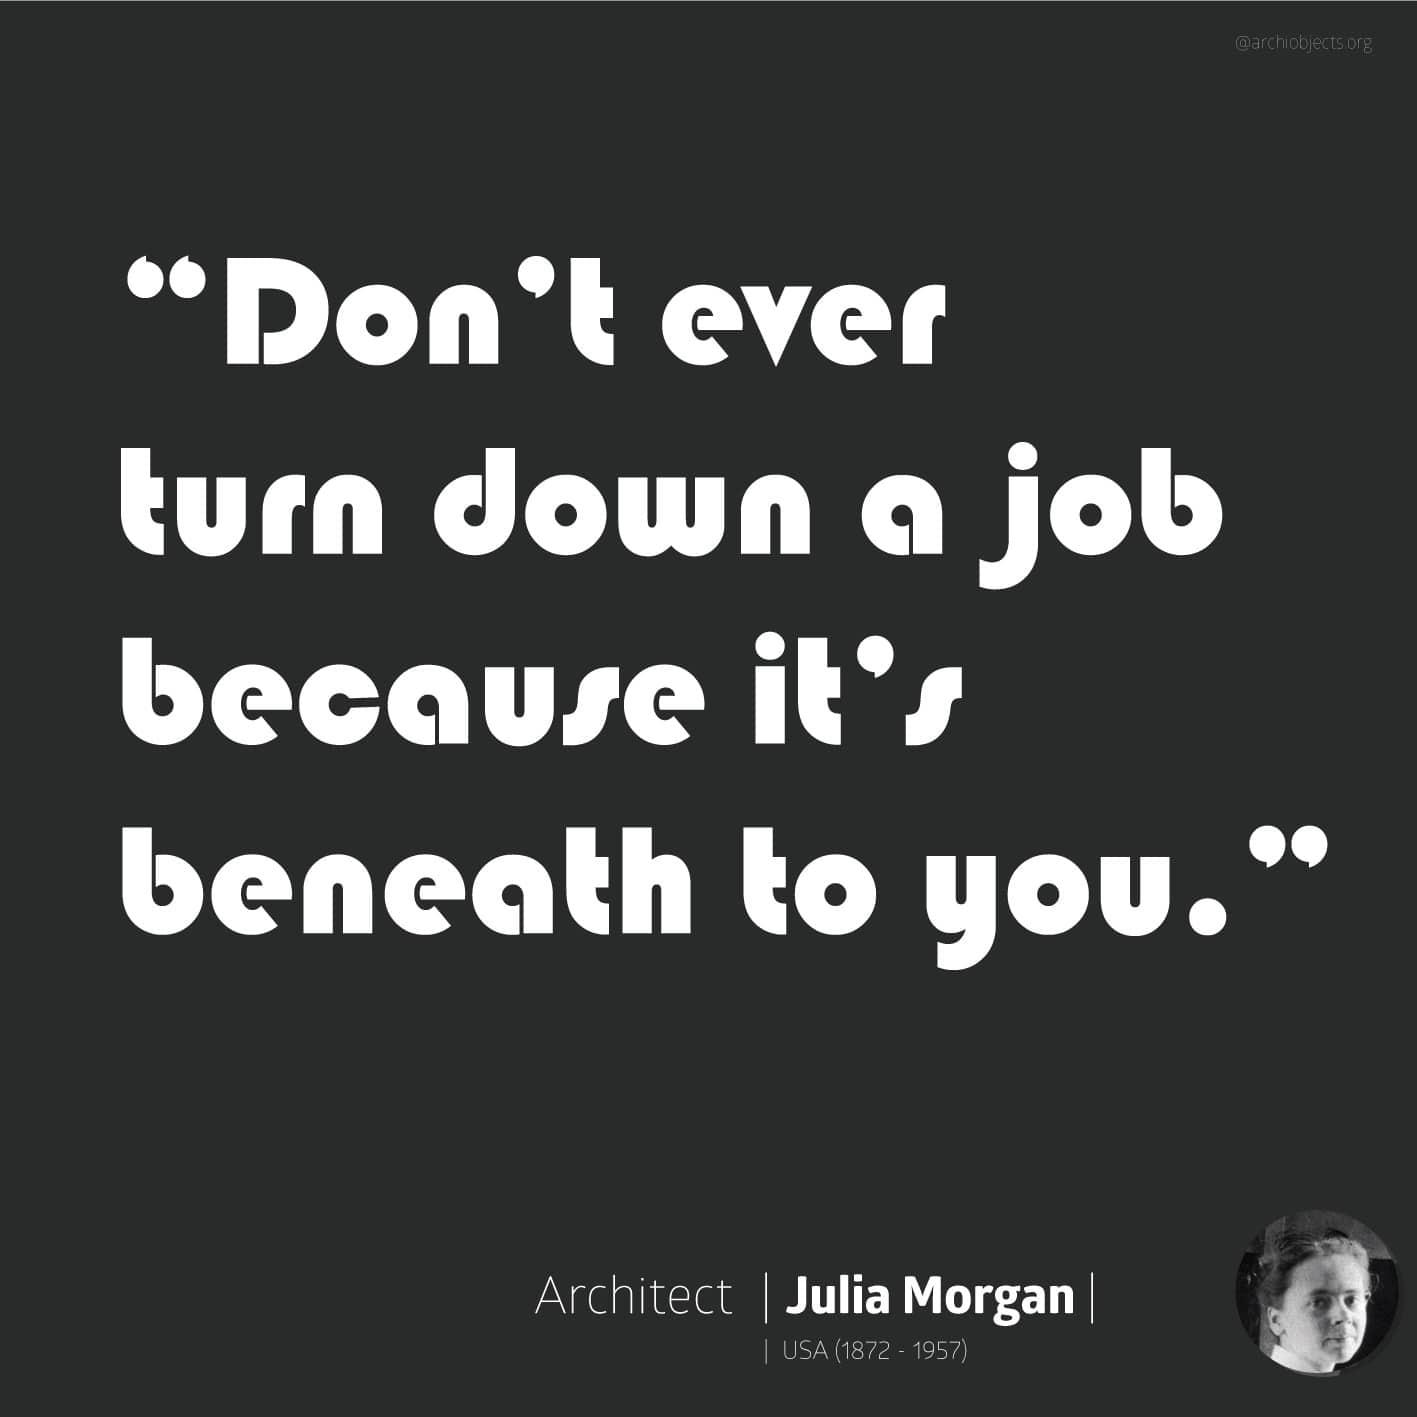 julia morgan quote